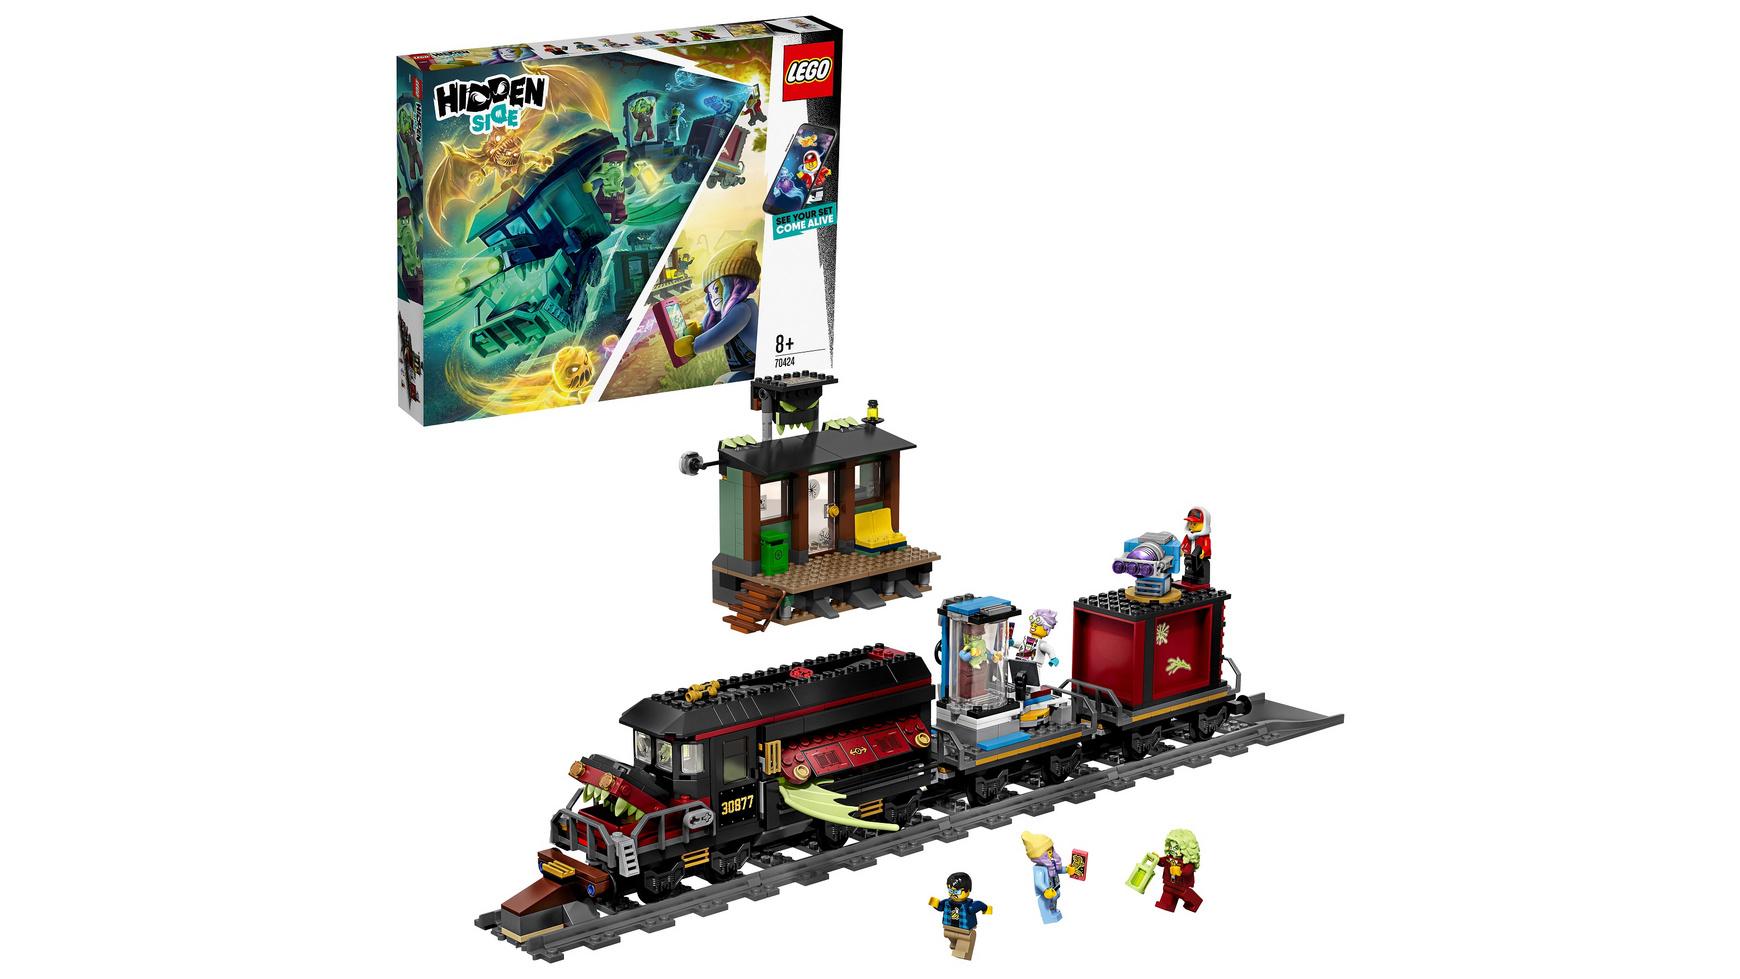 LEGO 70424 Hidden Side Geister-Expresszug ( Müller & Amazon)